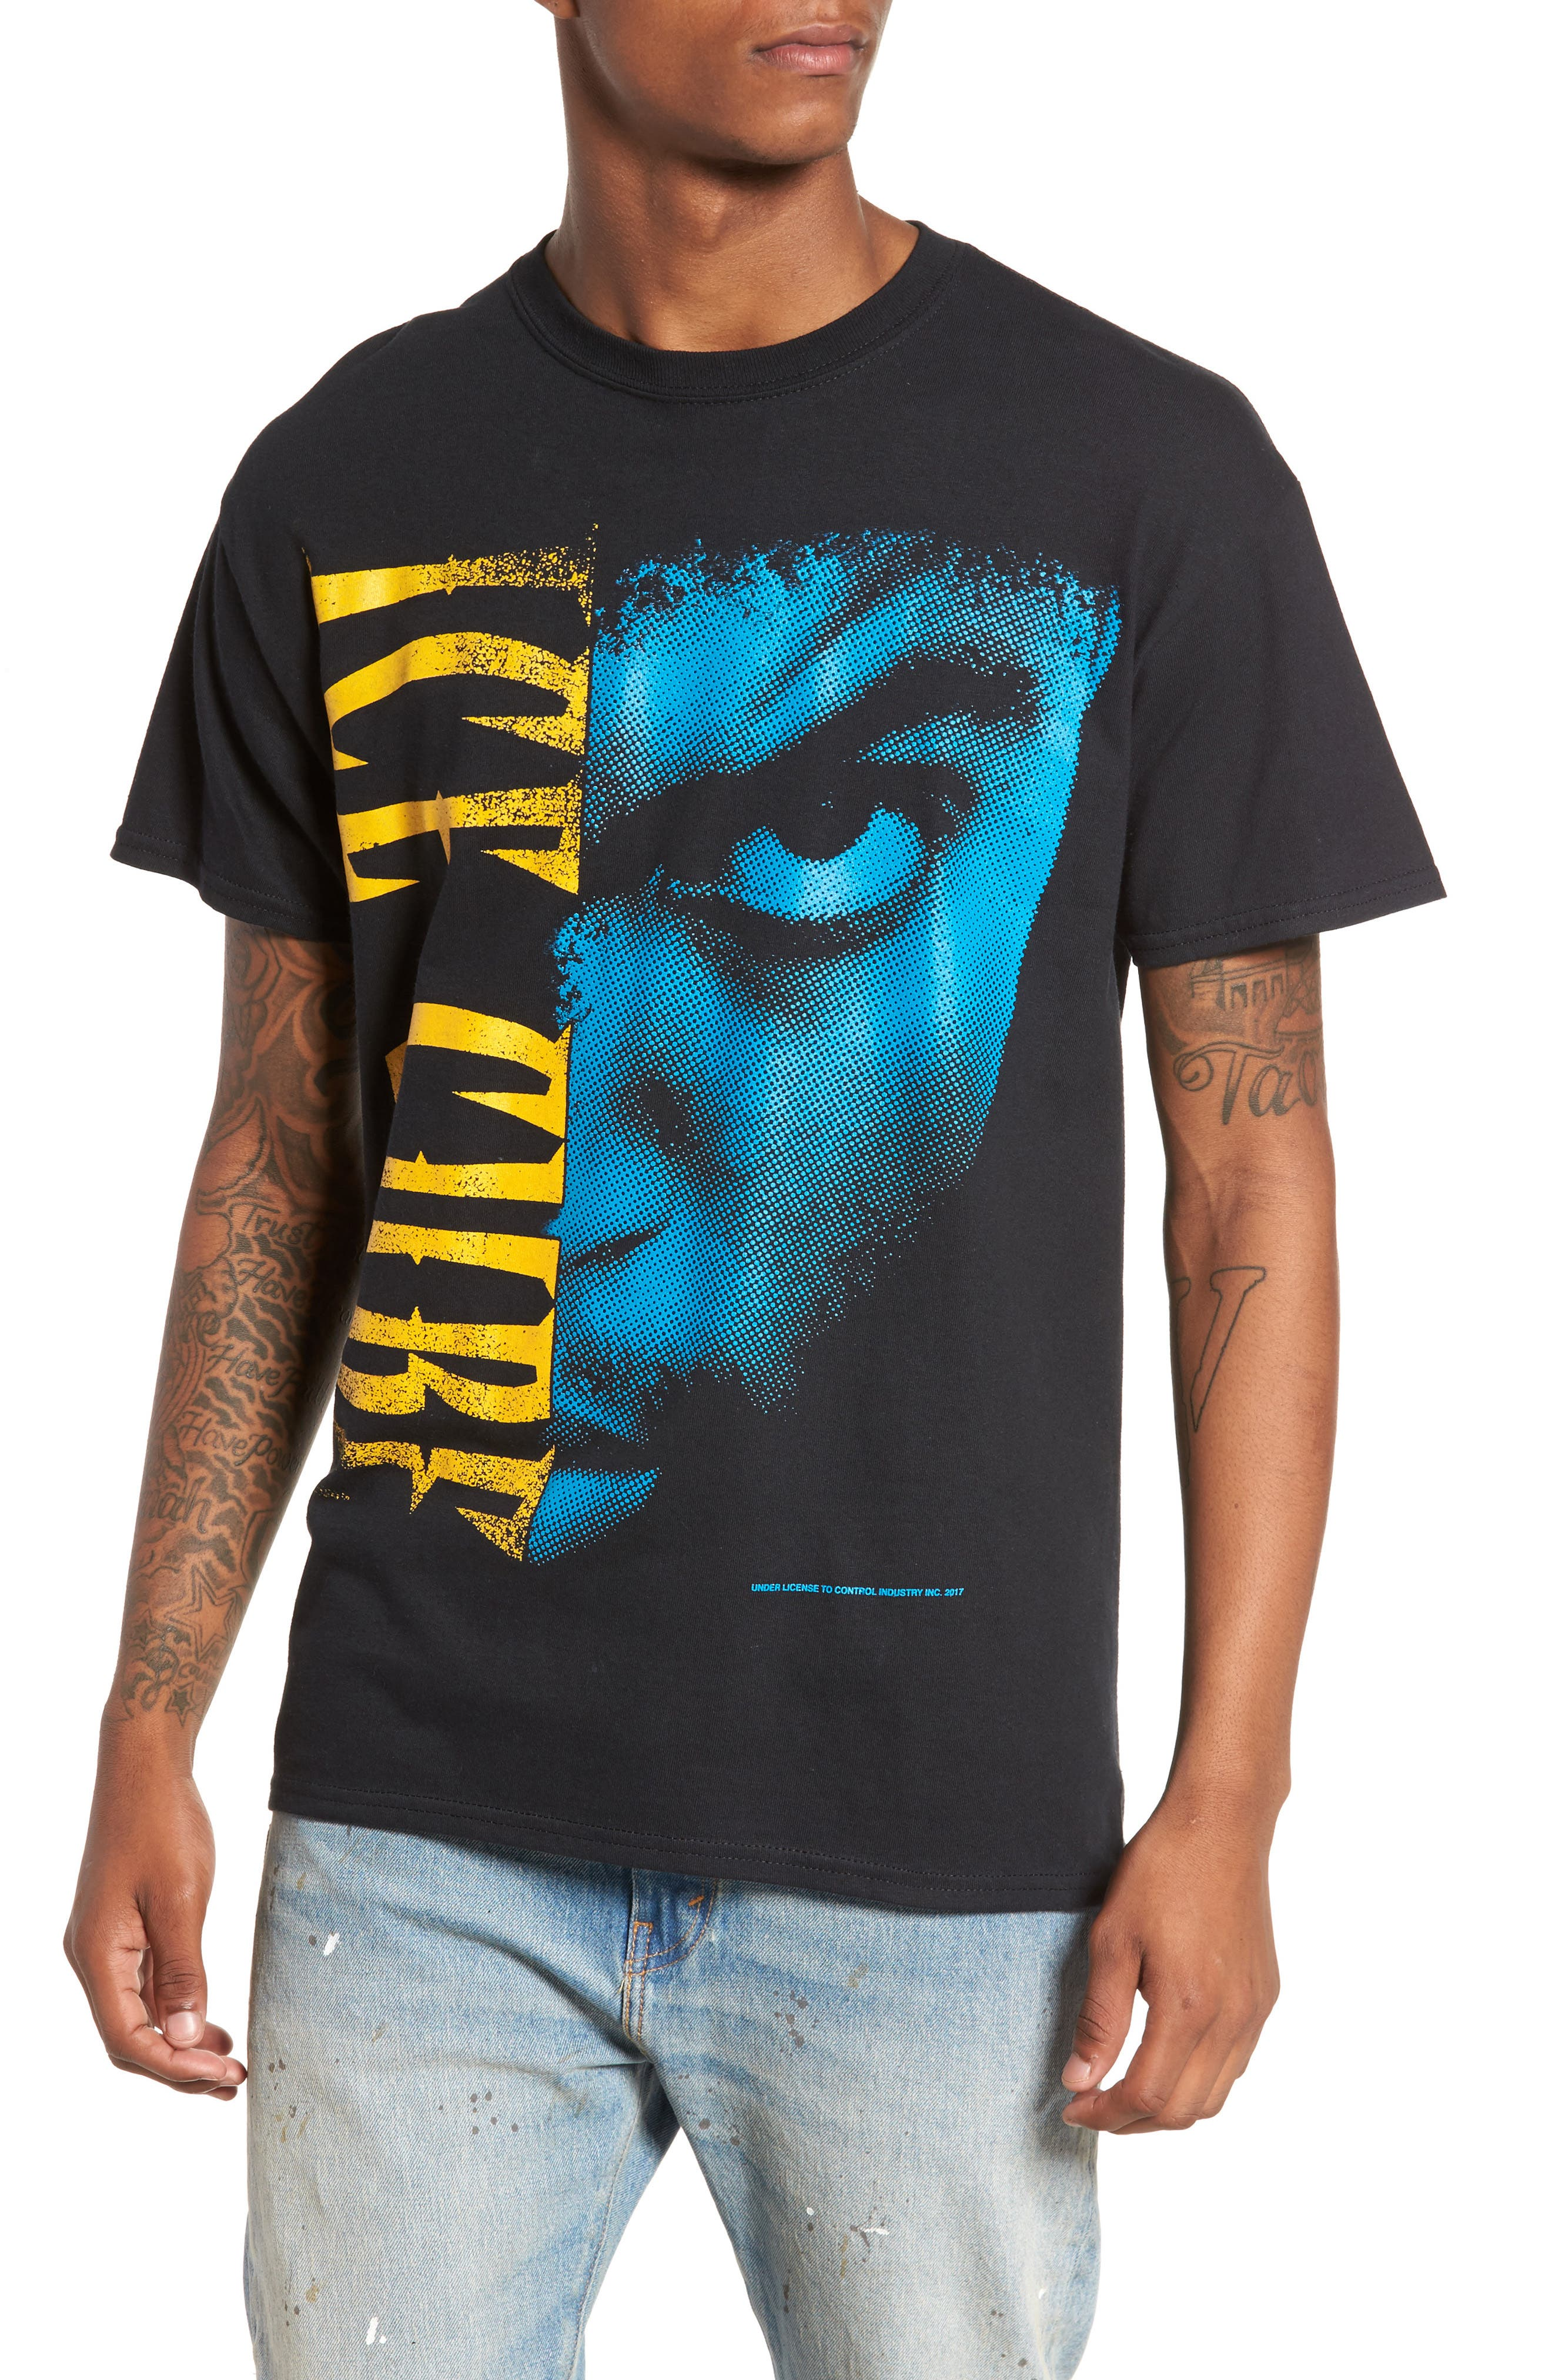 Ice Cube T-Shirt,                         Main,                         color, Black Tee Ice Cube Face